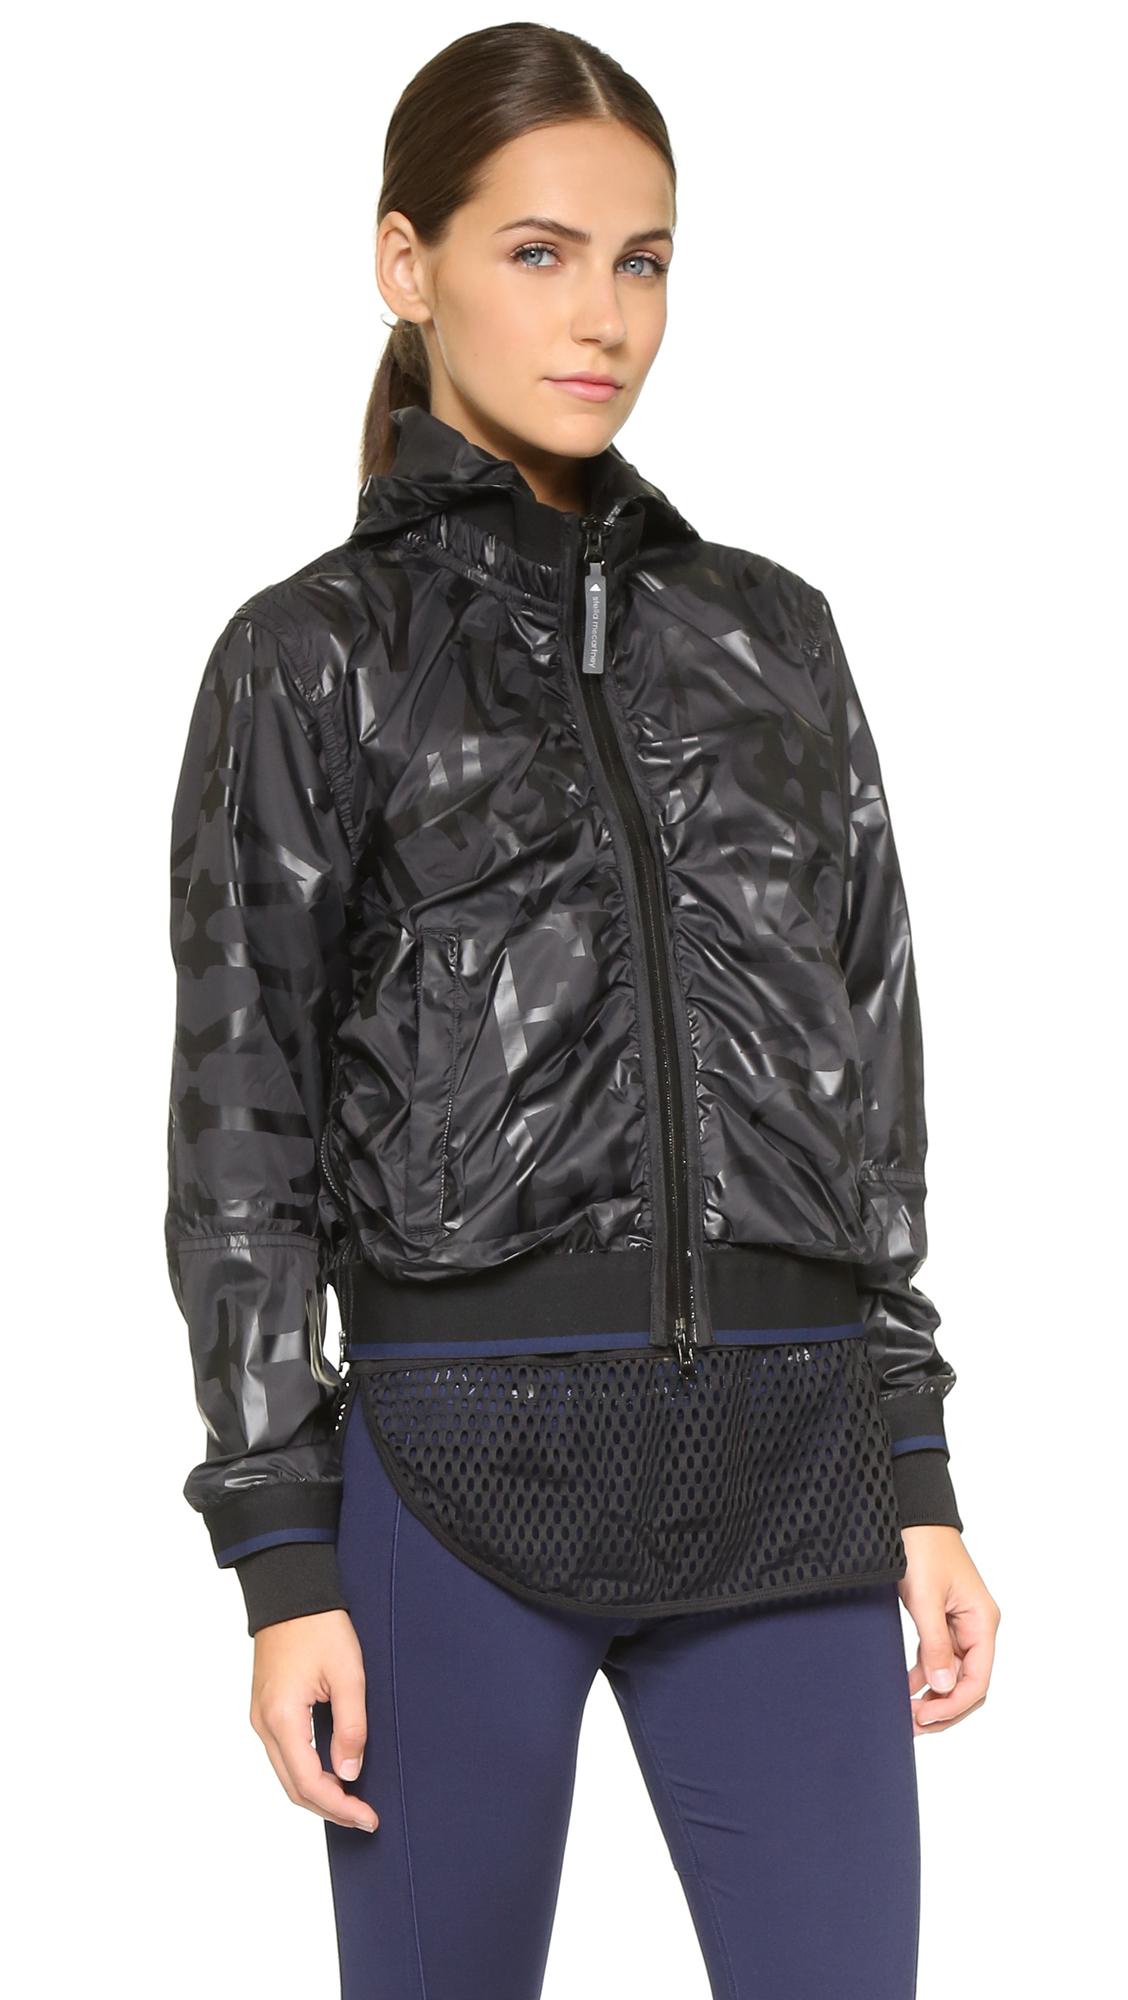 lyst adidas by stella mccartney running perf jacket. Black Bedroom Furniture Sets. Home Design Ideas